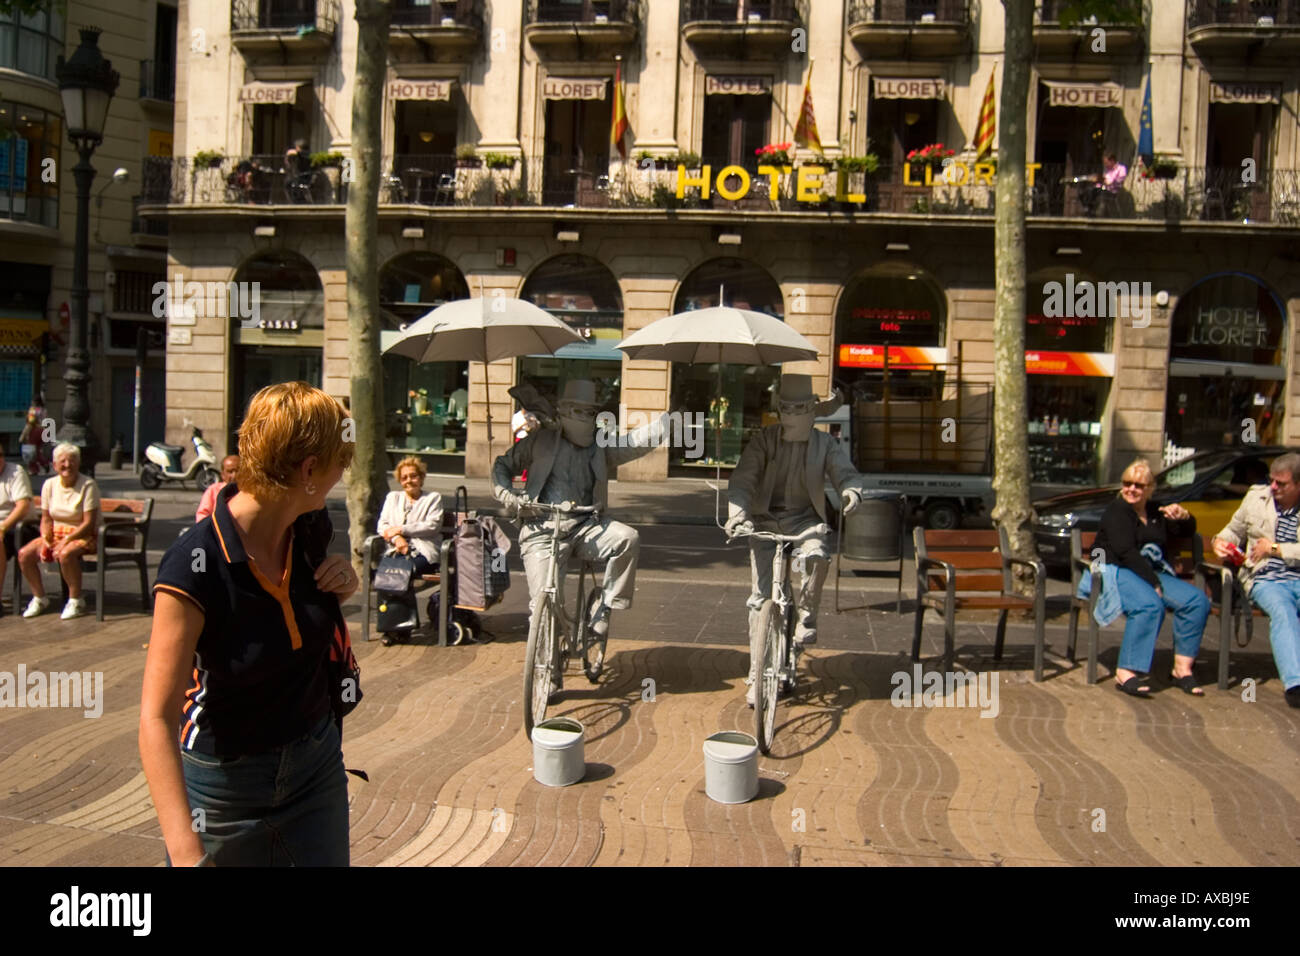 spain Barcelona Las ramblas street artists funny entertainer on bicycles - Stock Image